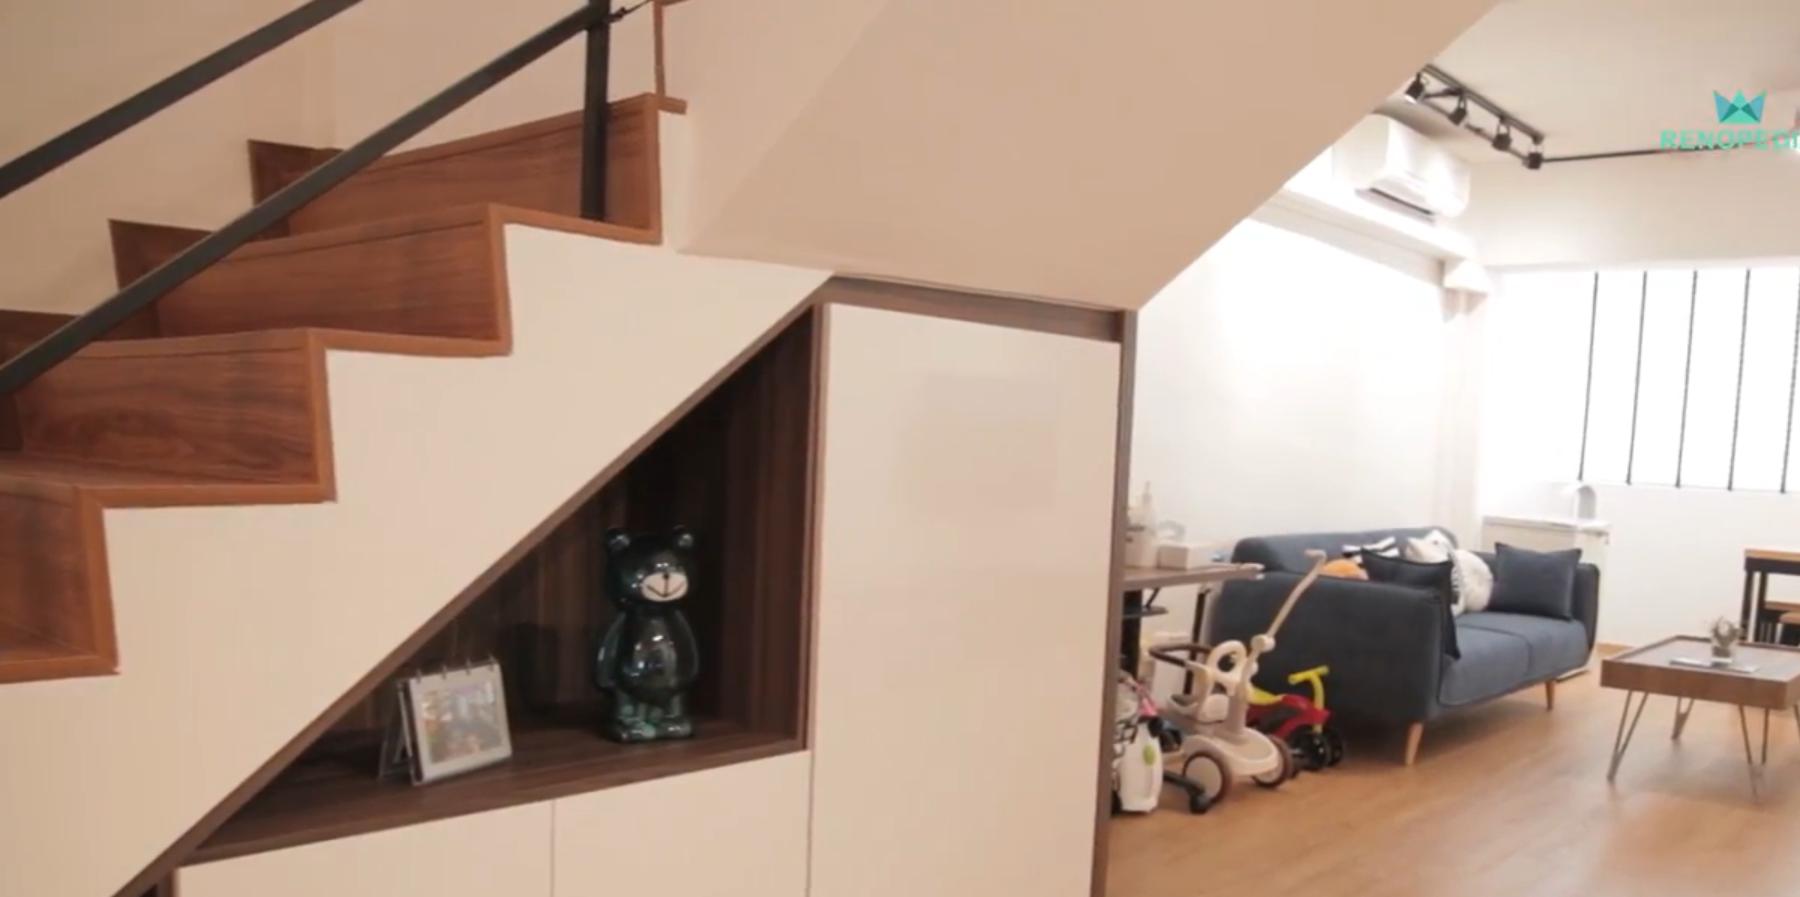 Interior Design Singapore | A Modest Scandinavian home by Des & Co